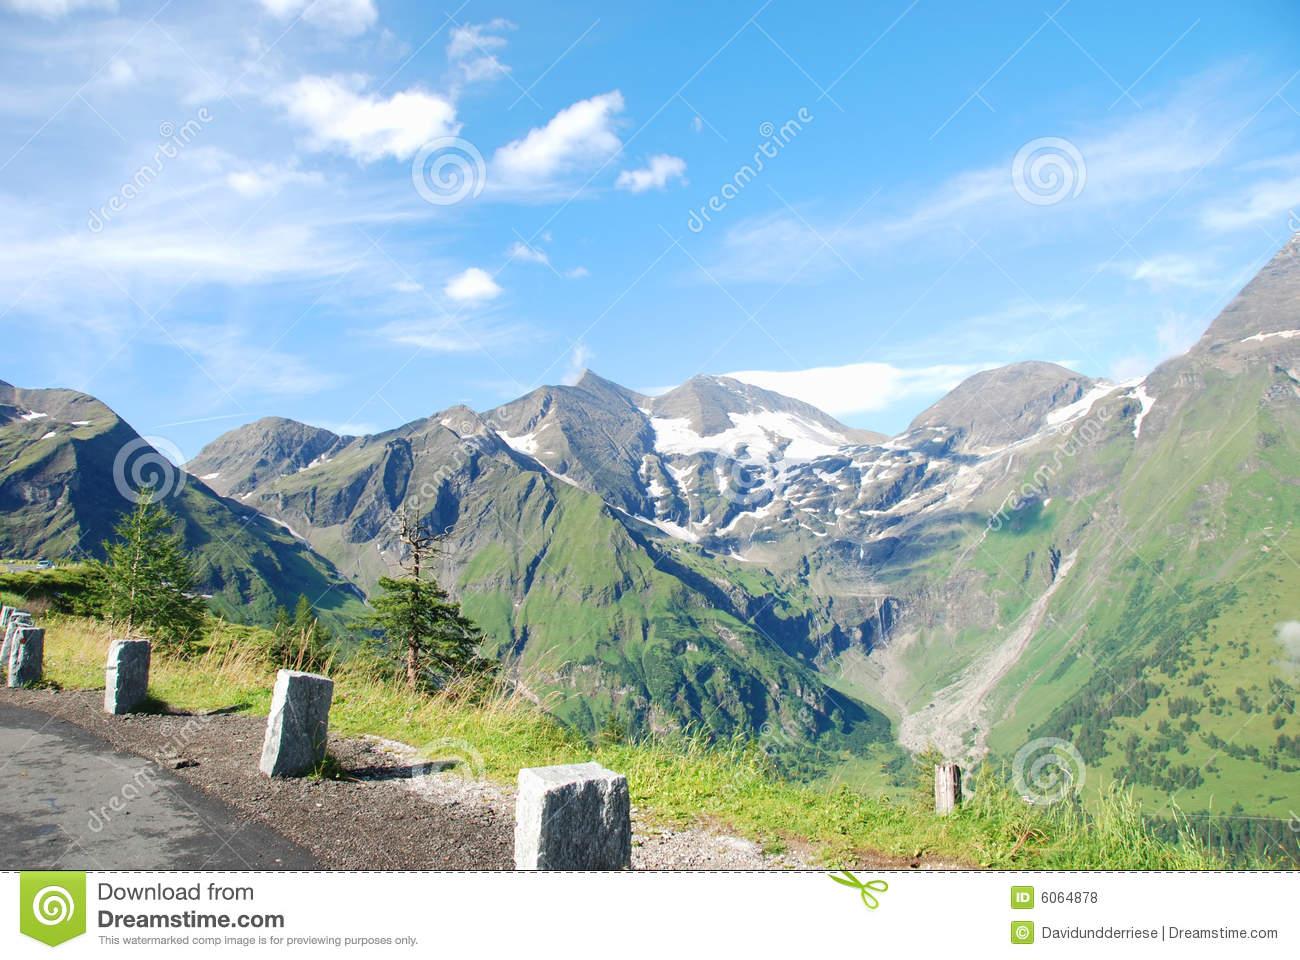 Grossglockner High Alpine Road. Royalty Free Stock Photos.